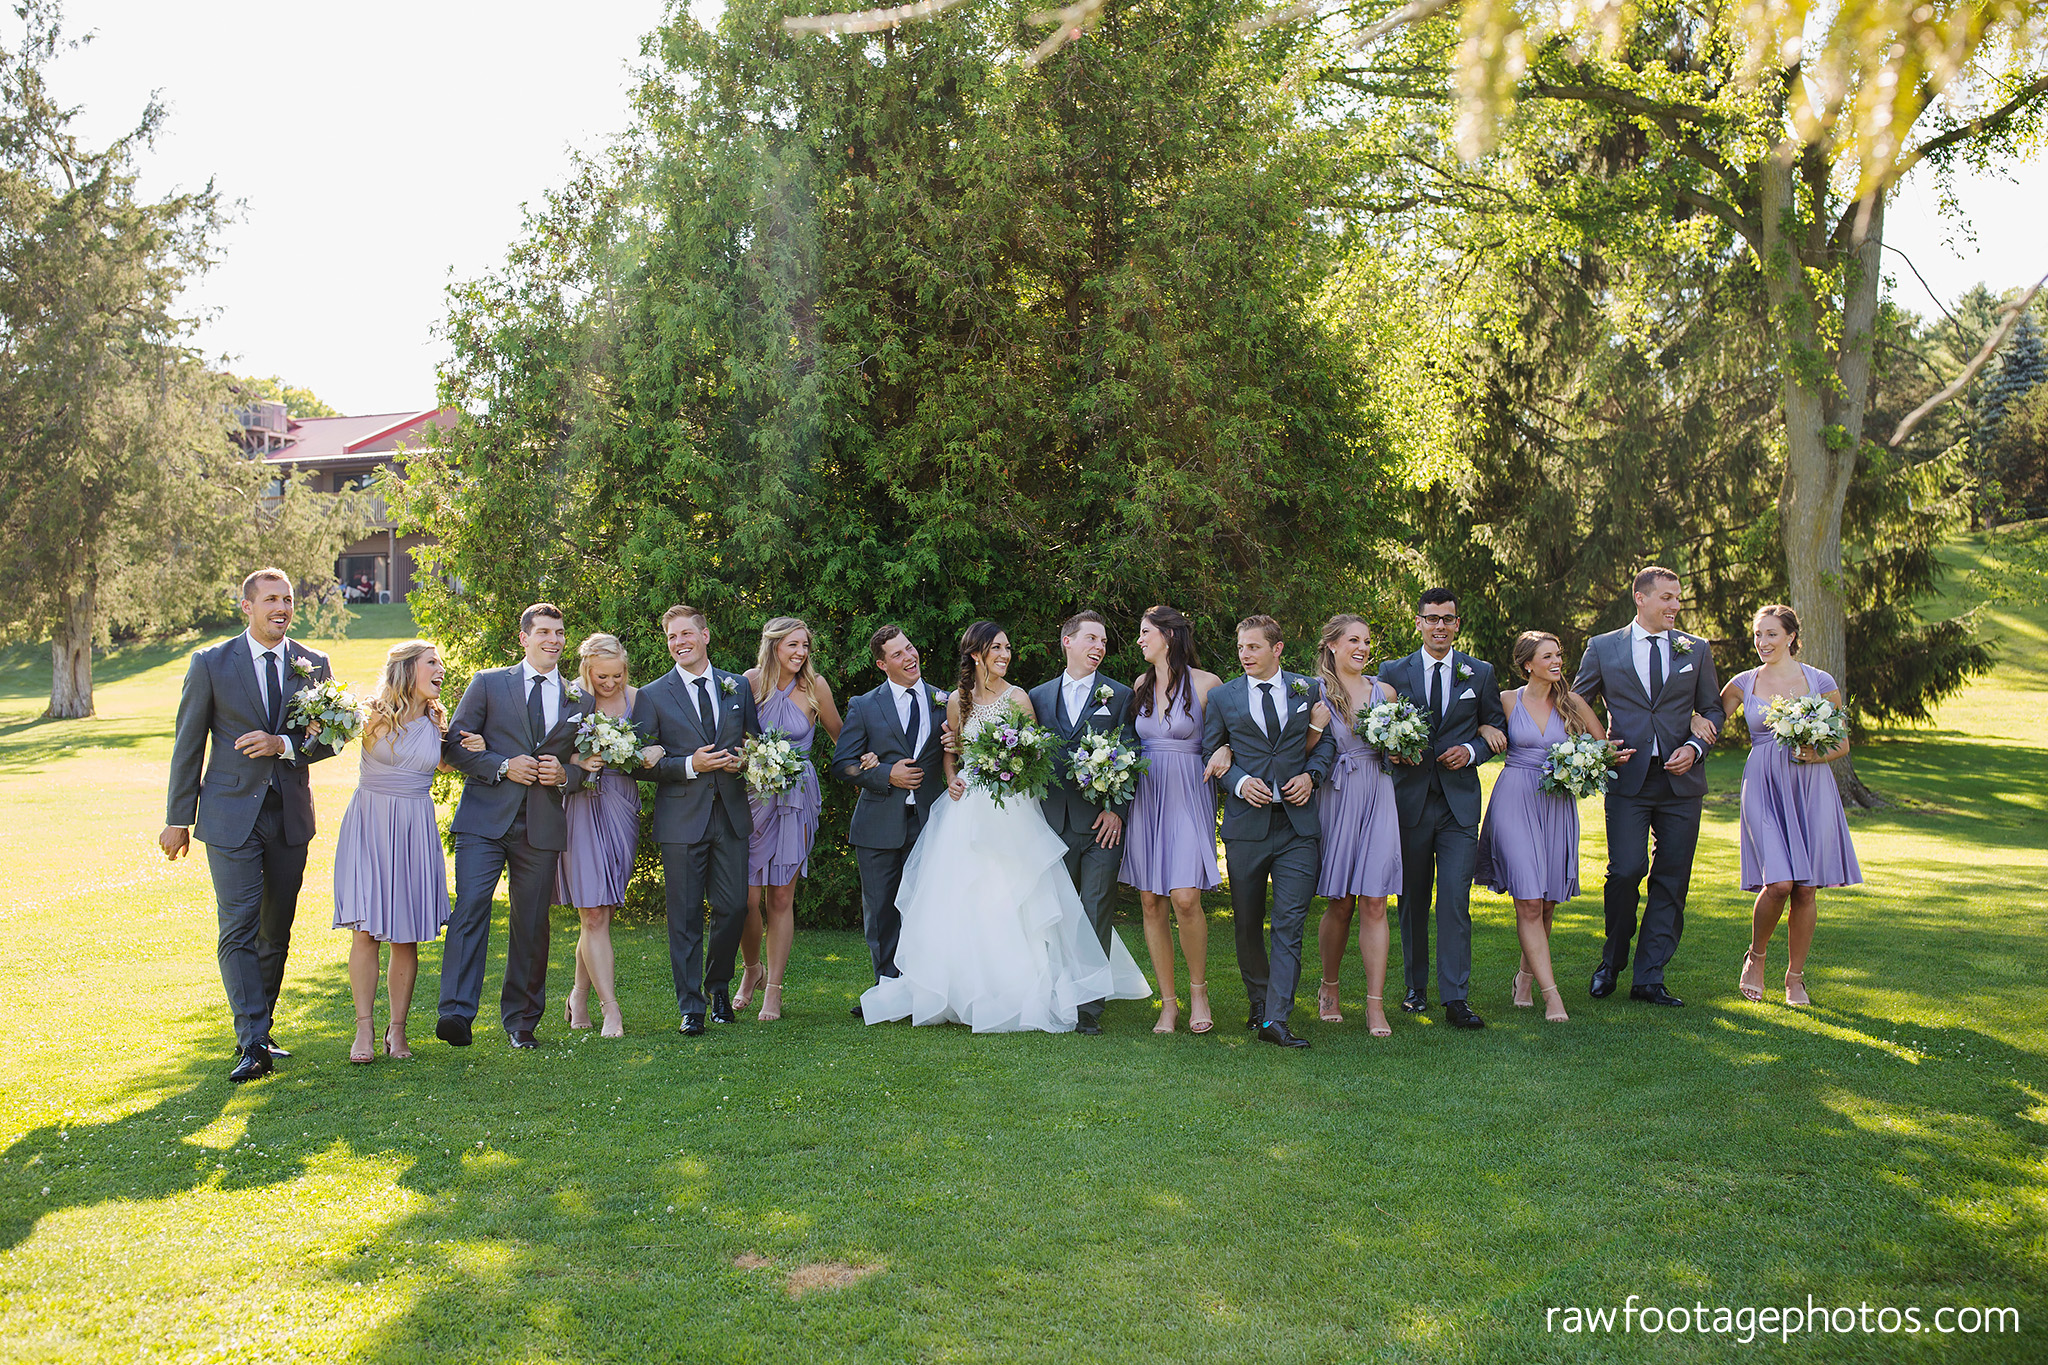 london_ontario_wedding_photographer-grand_bend_wedding_photographer-oakwood_resort_wedding-beach_wedding-sunset_wedding-raw_footage_photography034.jpg